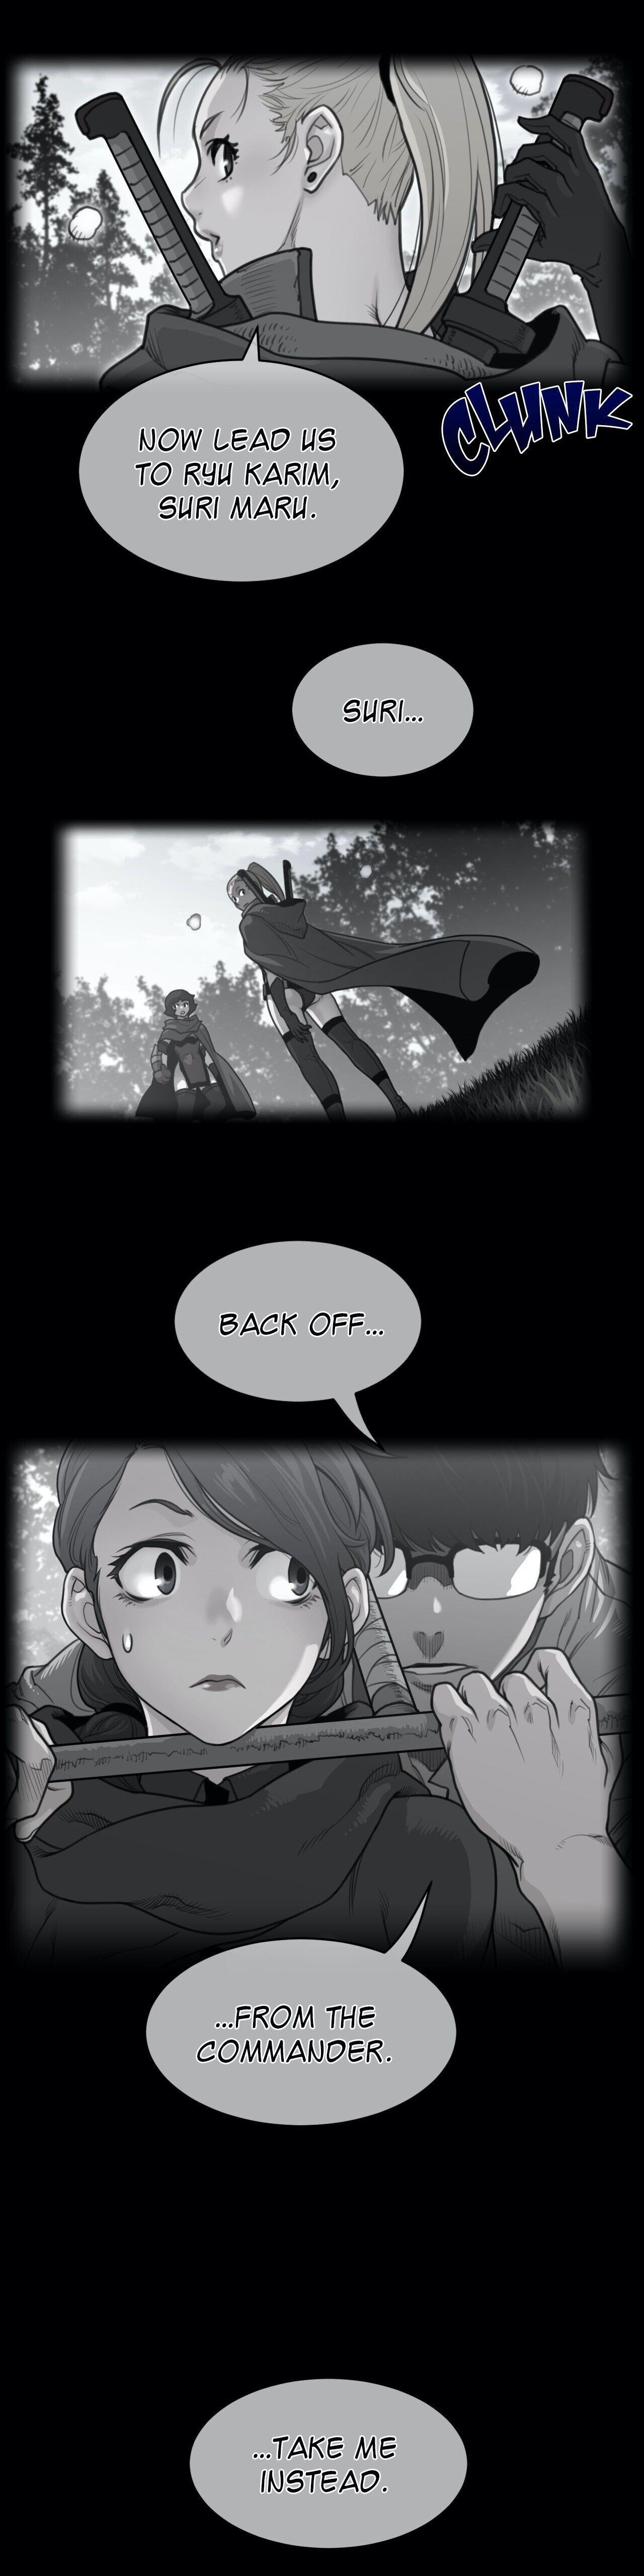 Perfect Half Chapter 135 : Another Reunion (Season 2 Finale) page 2 - Mangakakalots.com